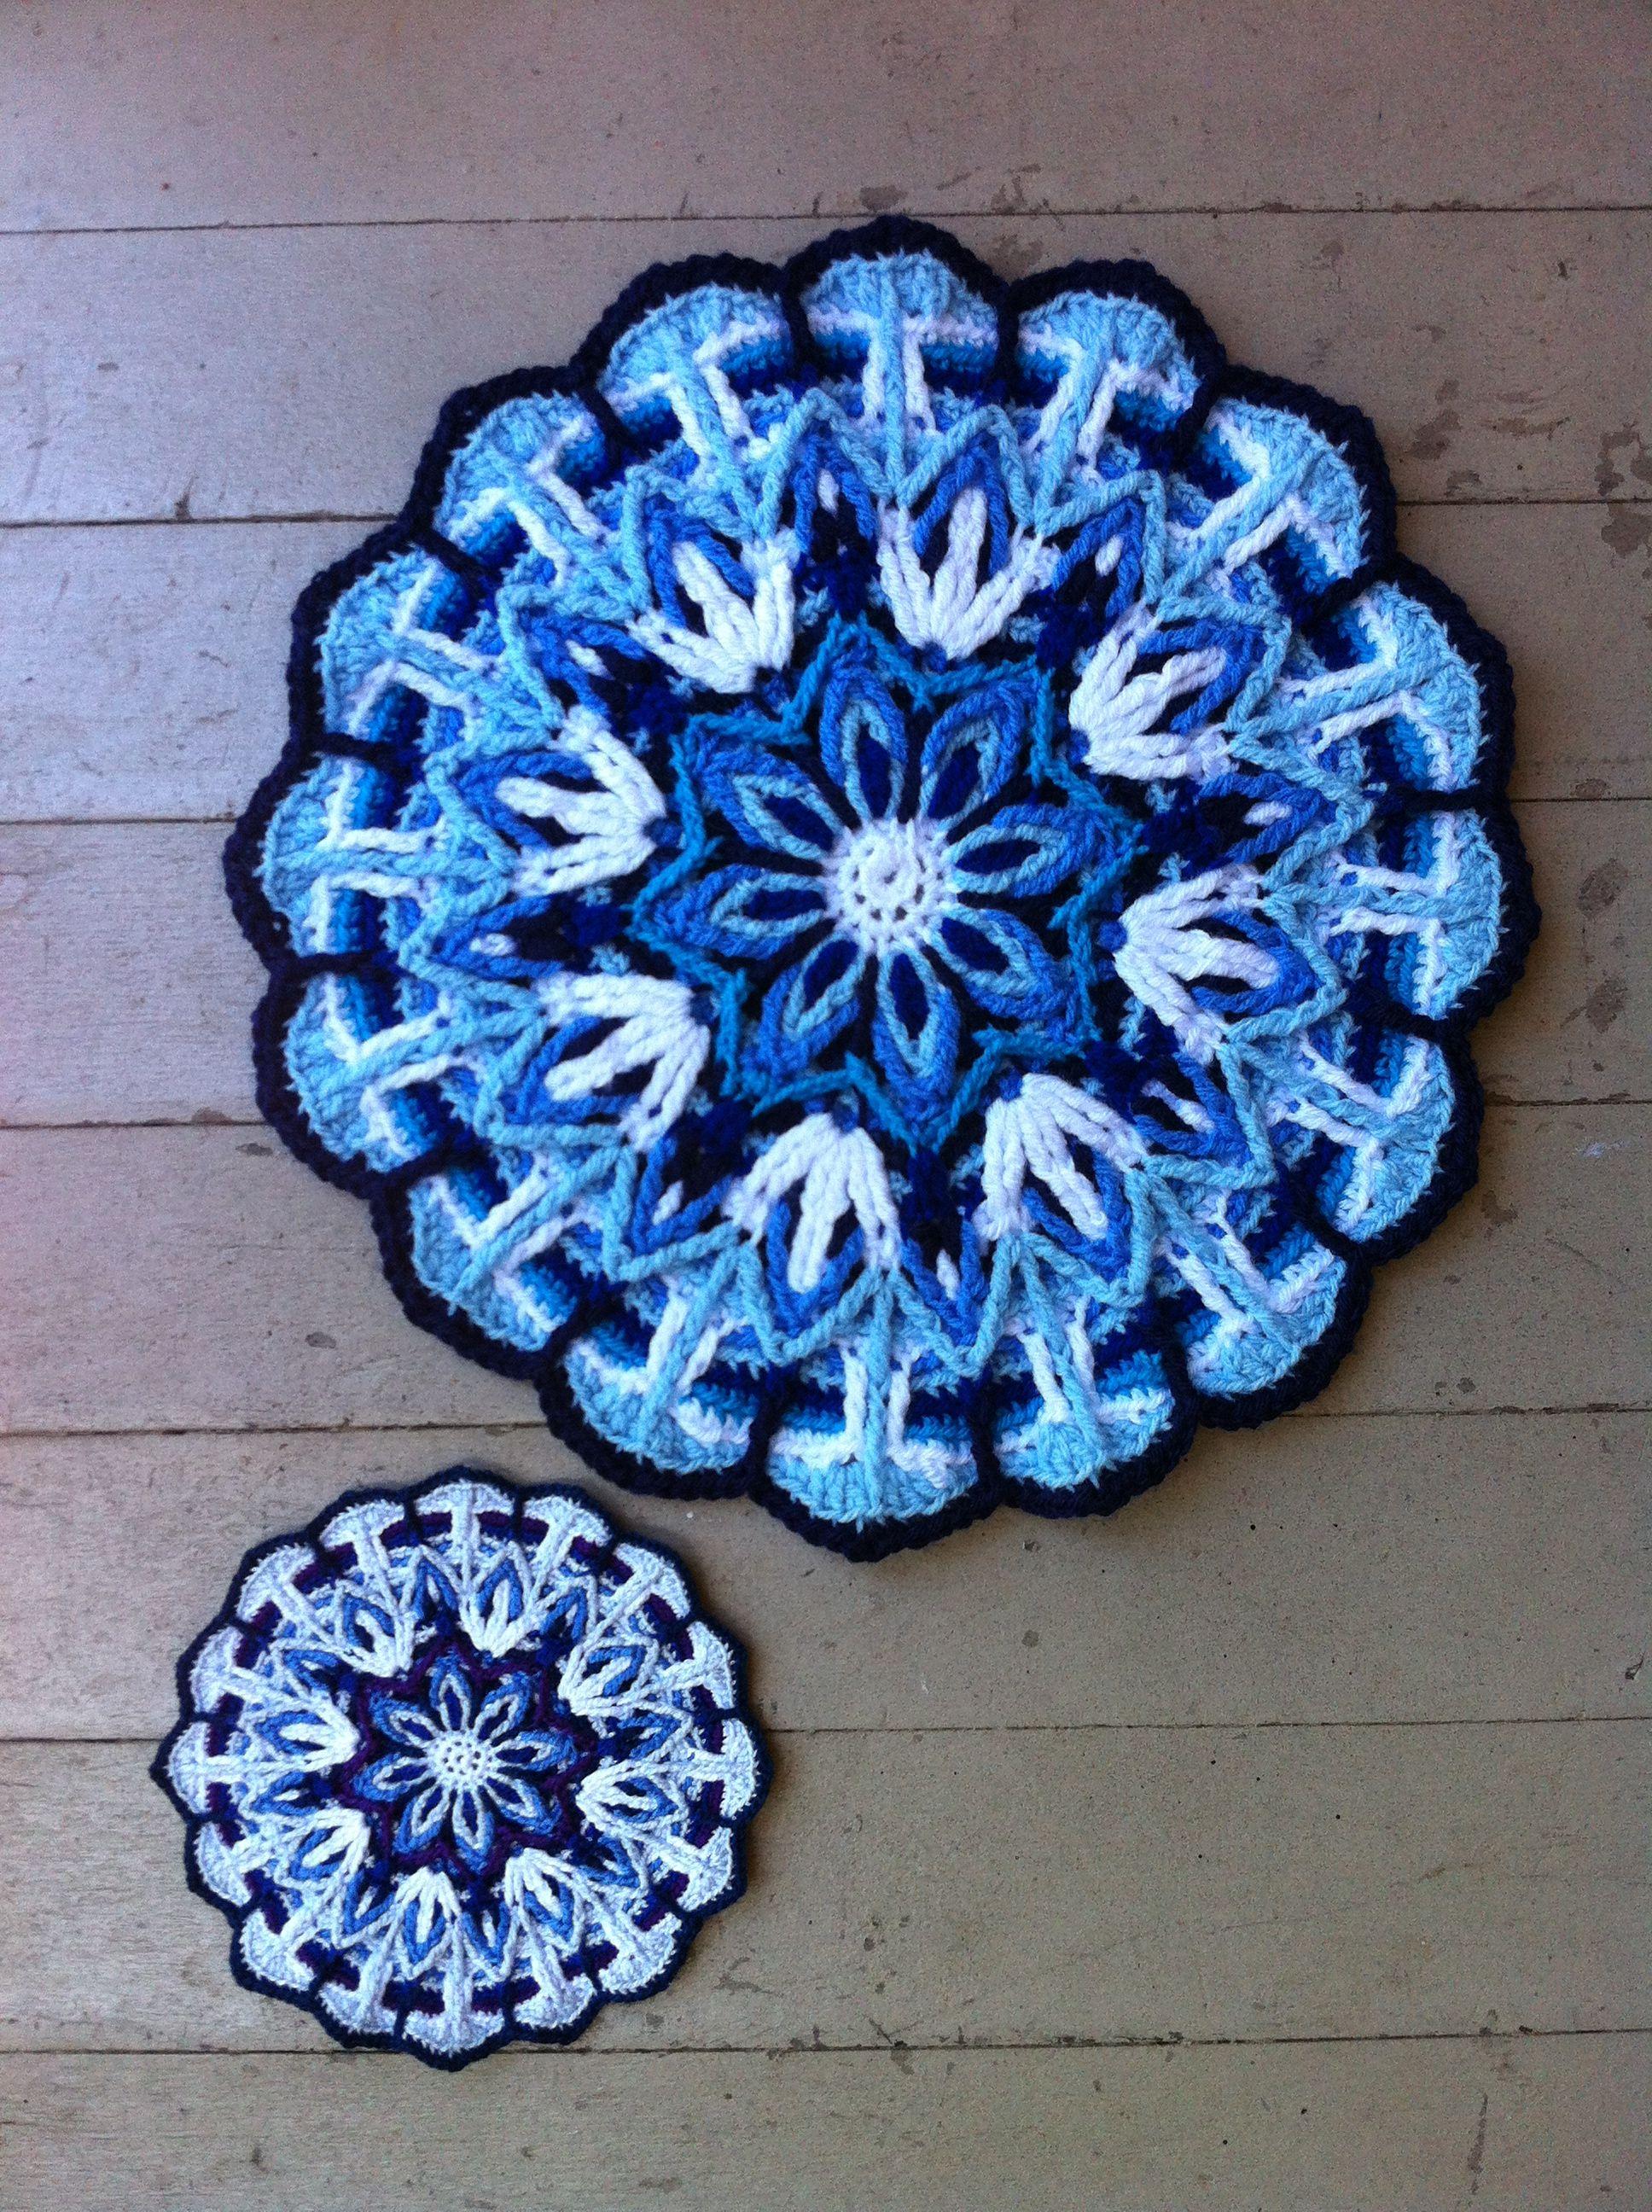 overlay crochet // linked to Etsy pattern